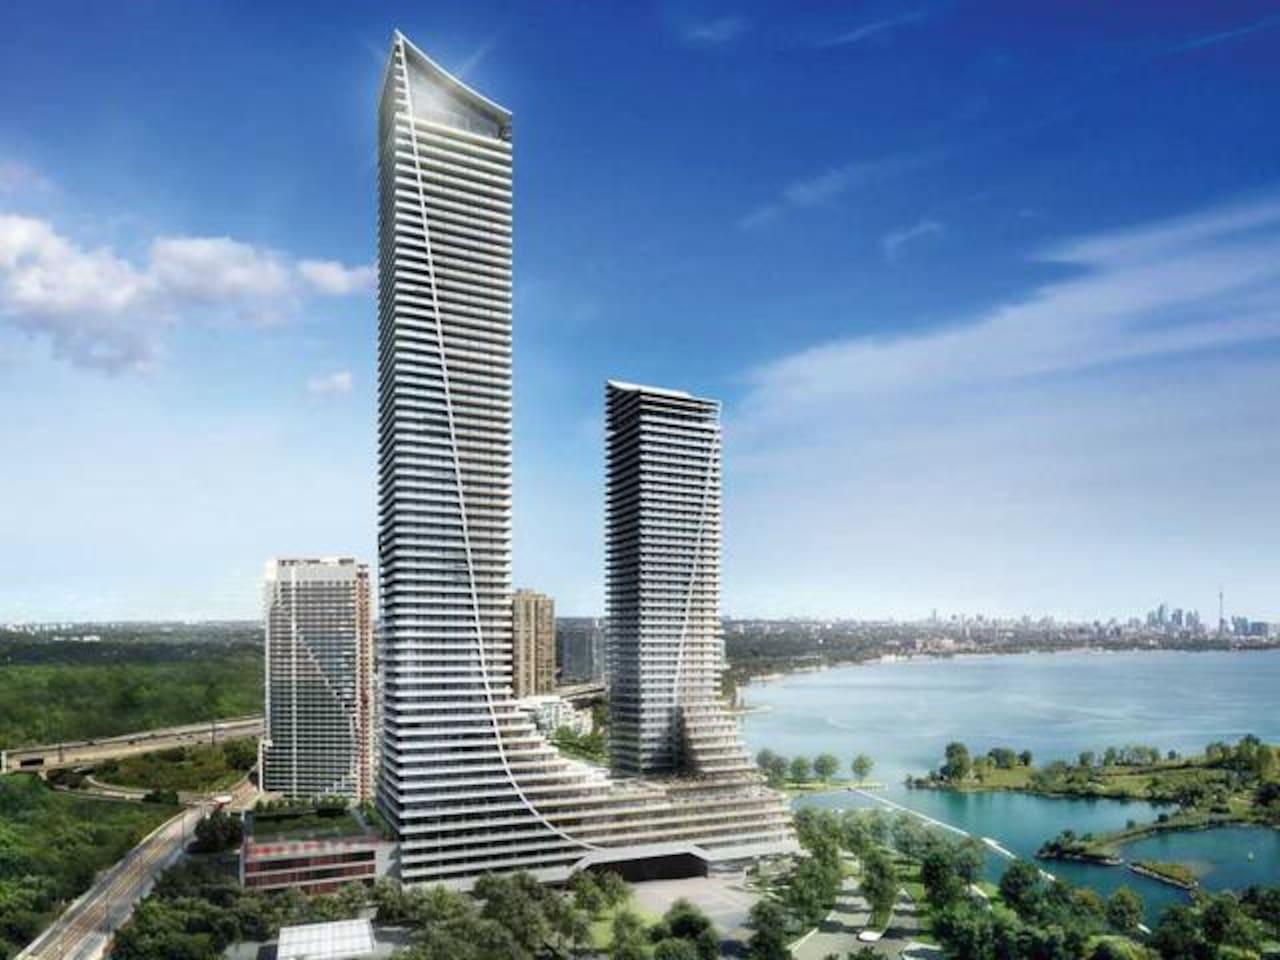 Landmark new towers overlooking the lake